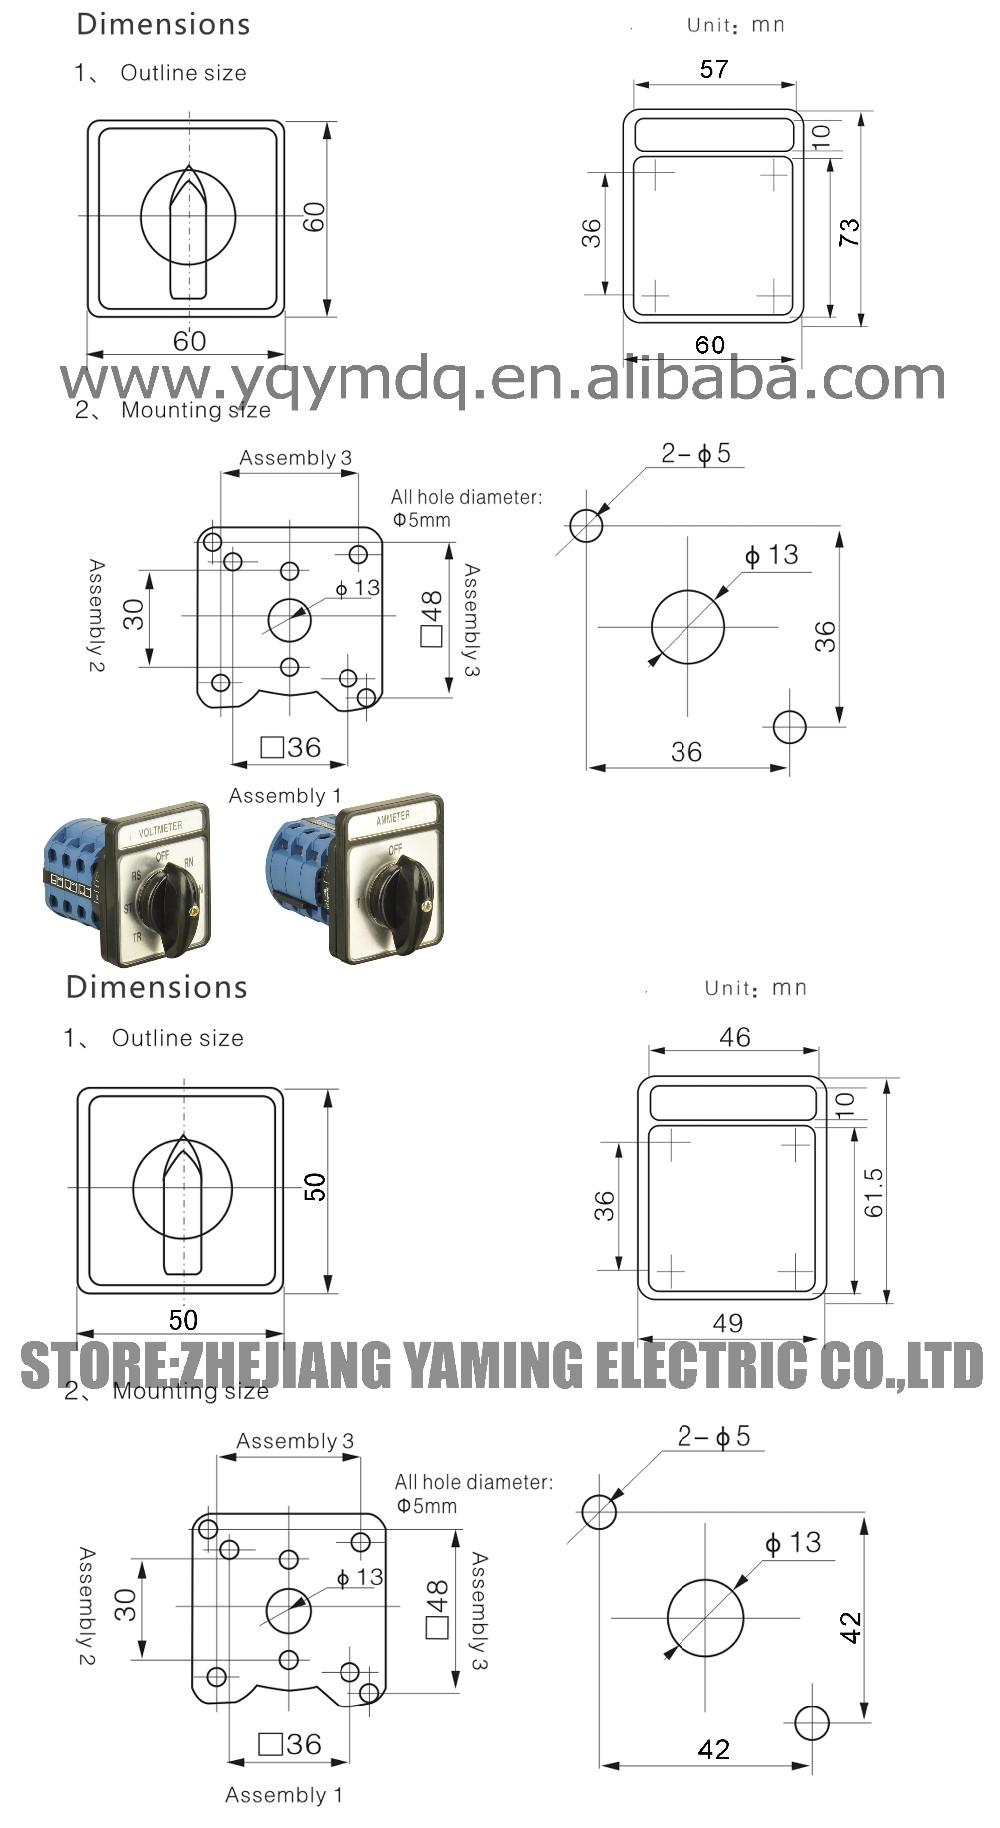 rotary switch wiring diagram wiring diagram view salzer boat lift switch wiring diagram rotary switch wiring